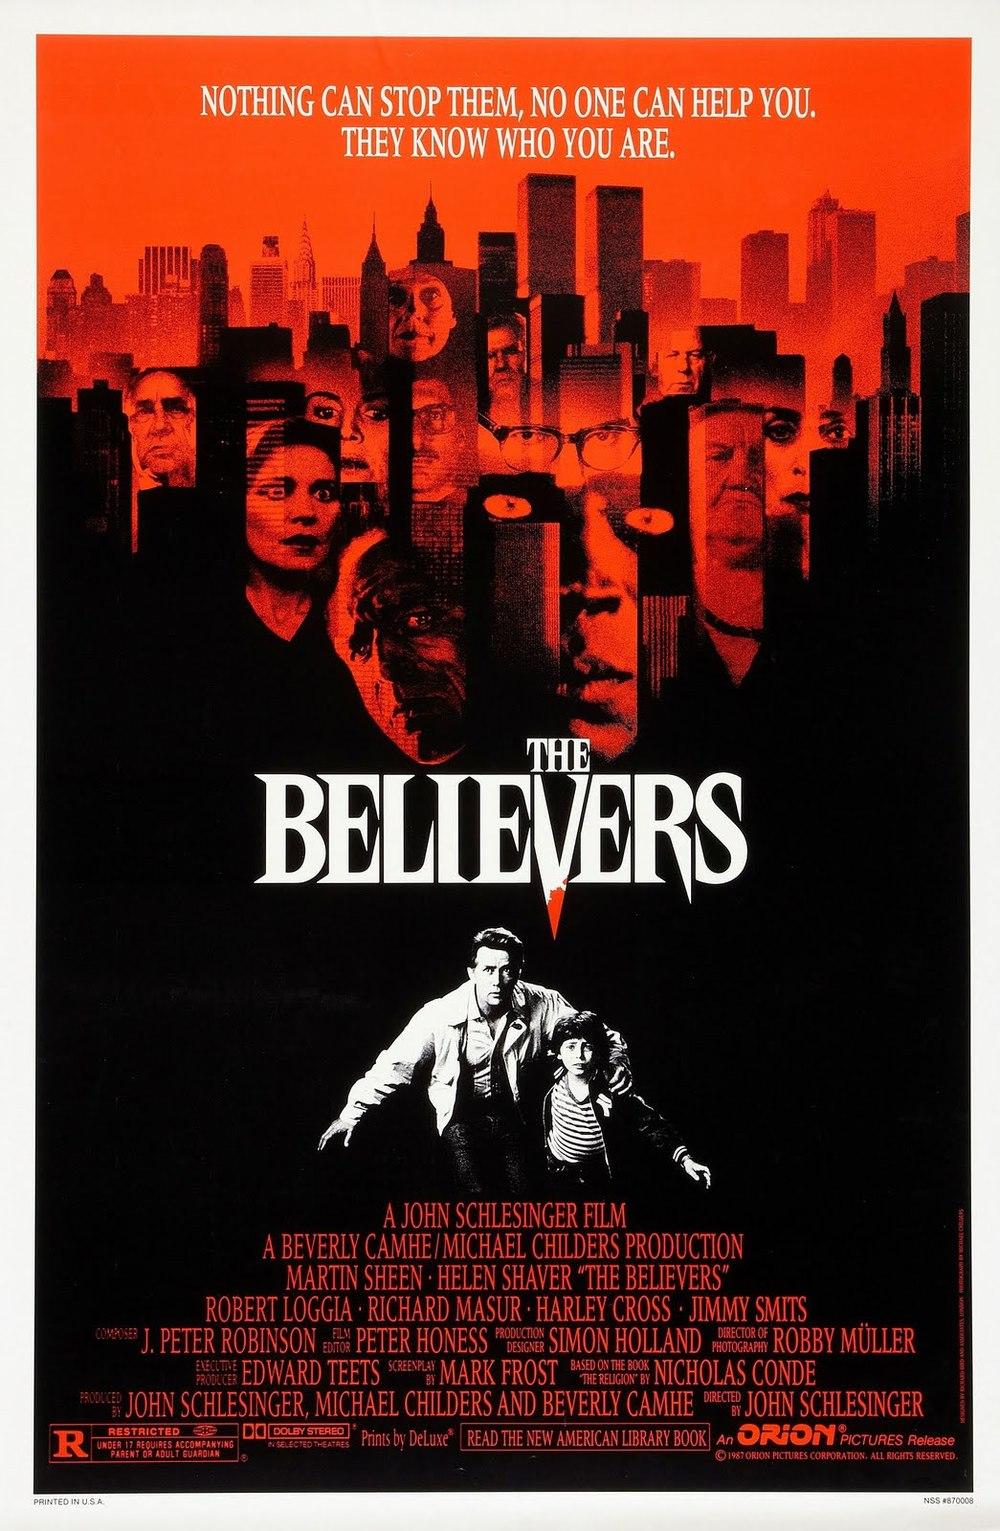 believers_poster_01.jpg